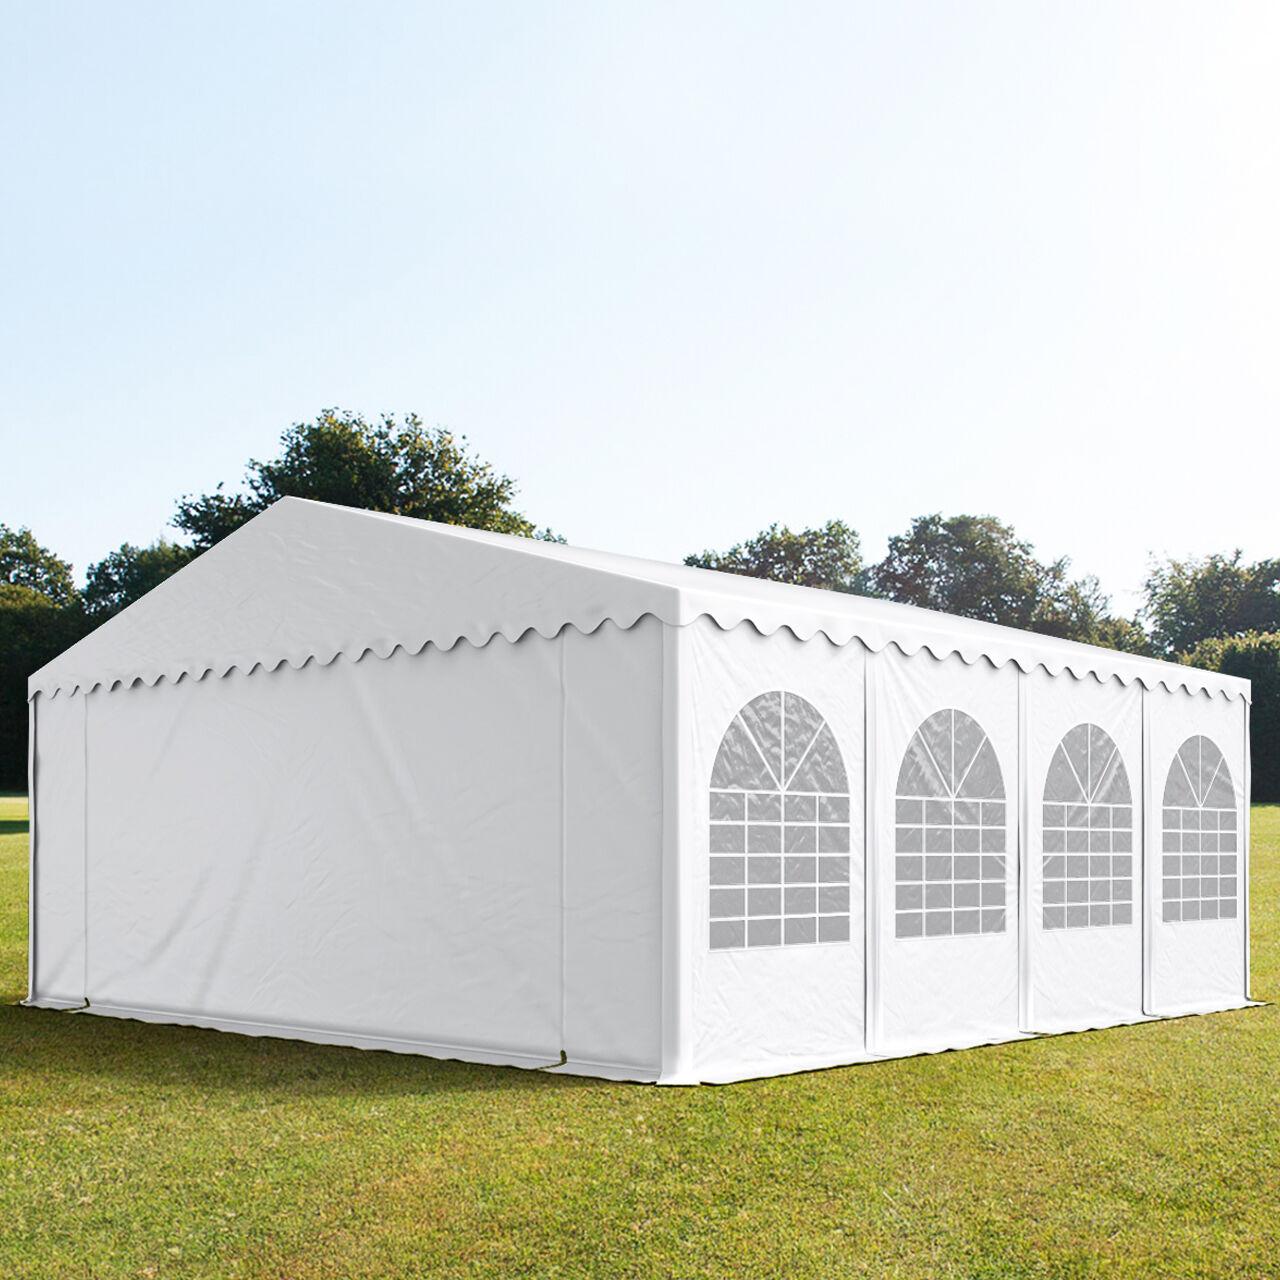 Toolport Tendone per Feste 8x8m PVC 550 g/m² bianco sì